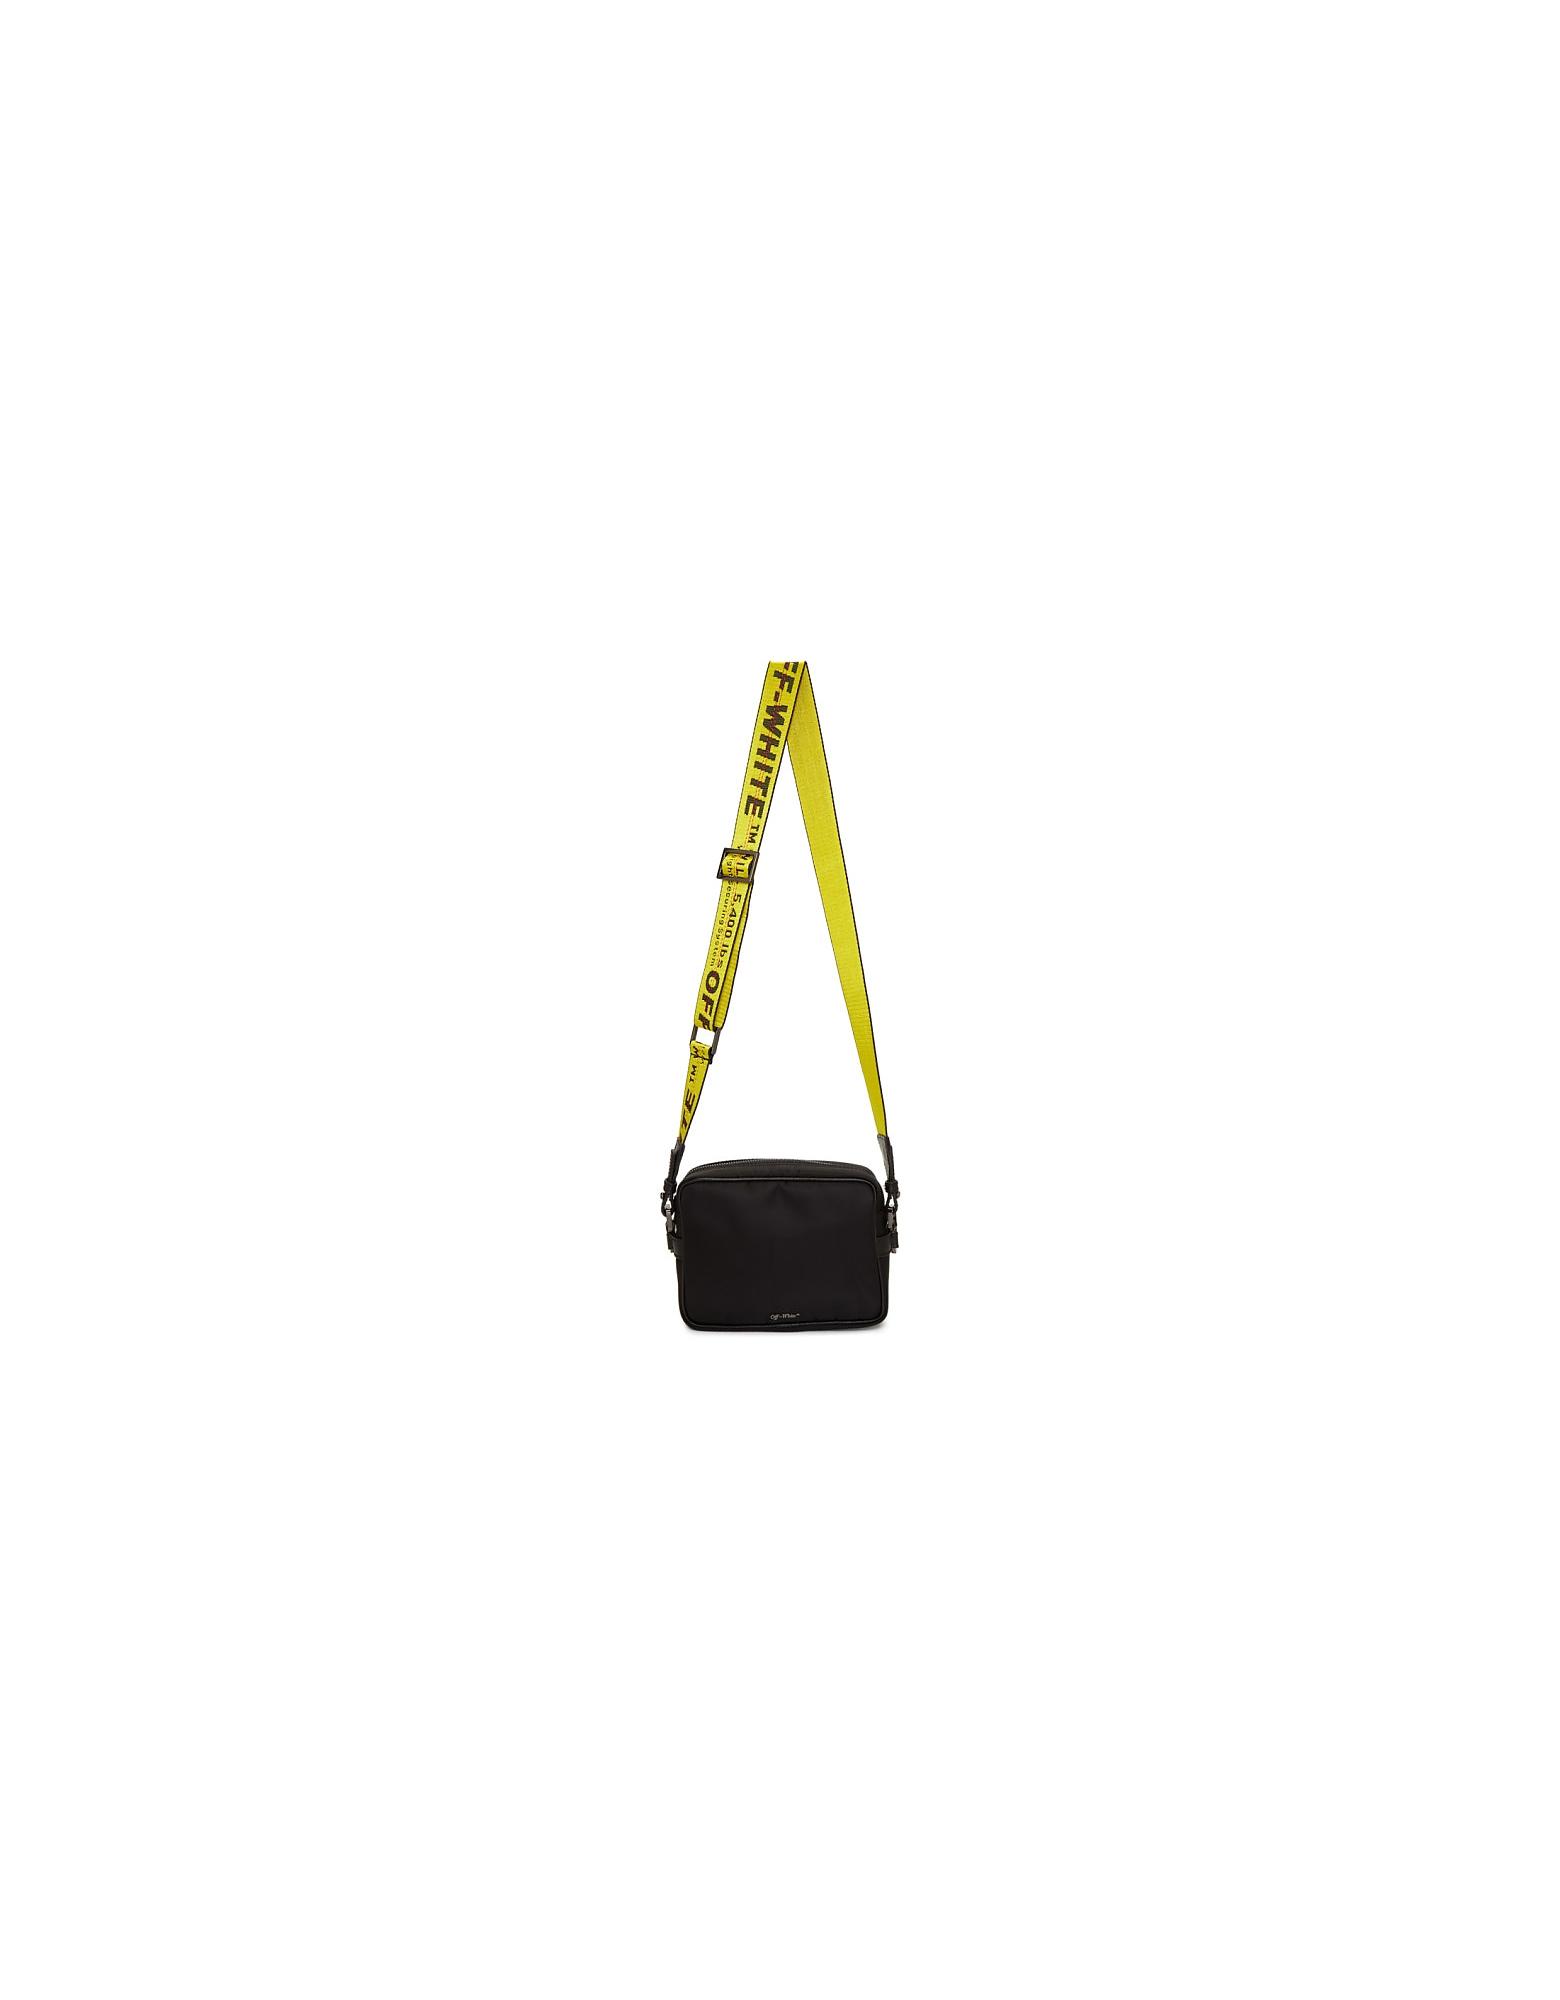 Off-White Designer Handbags, Black Crossbody Bag